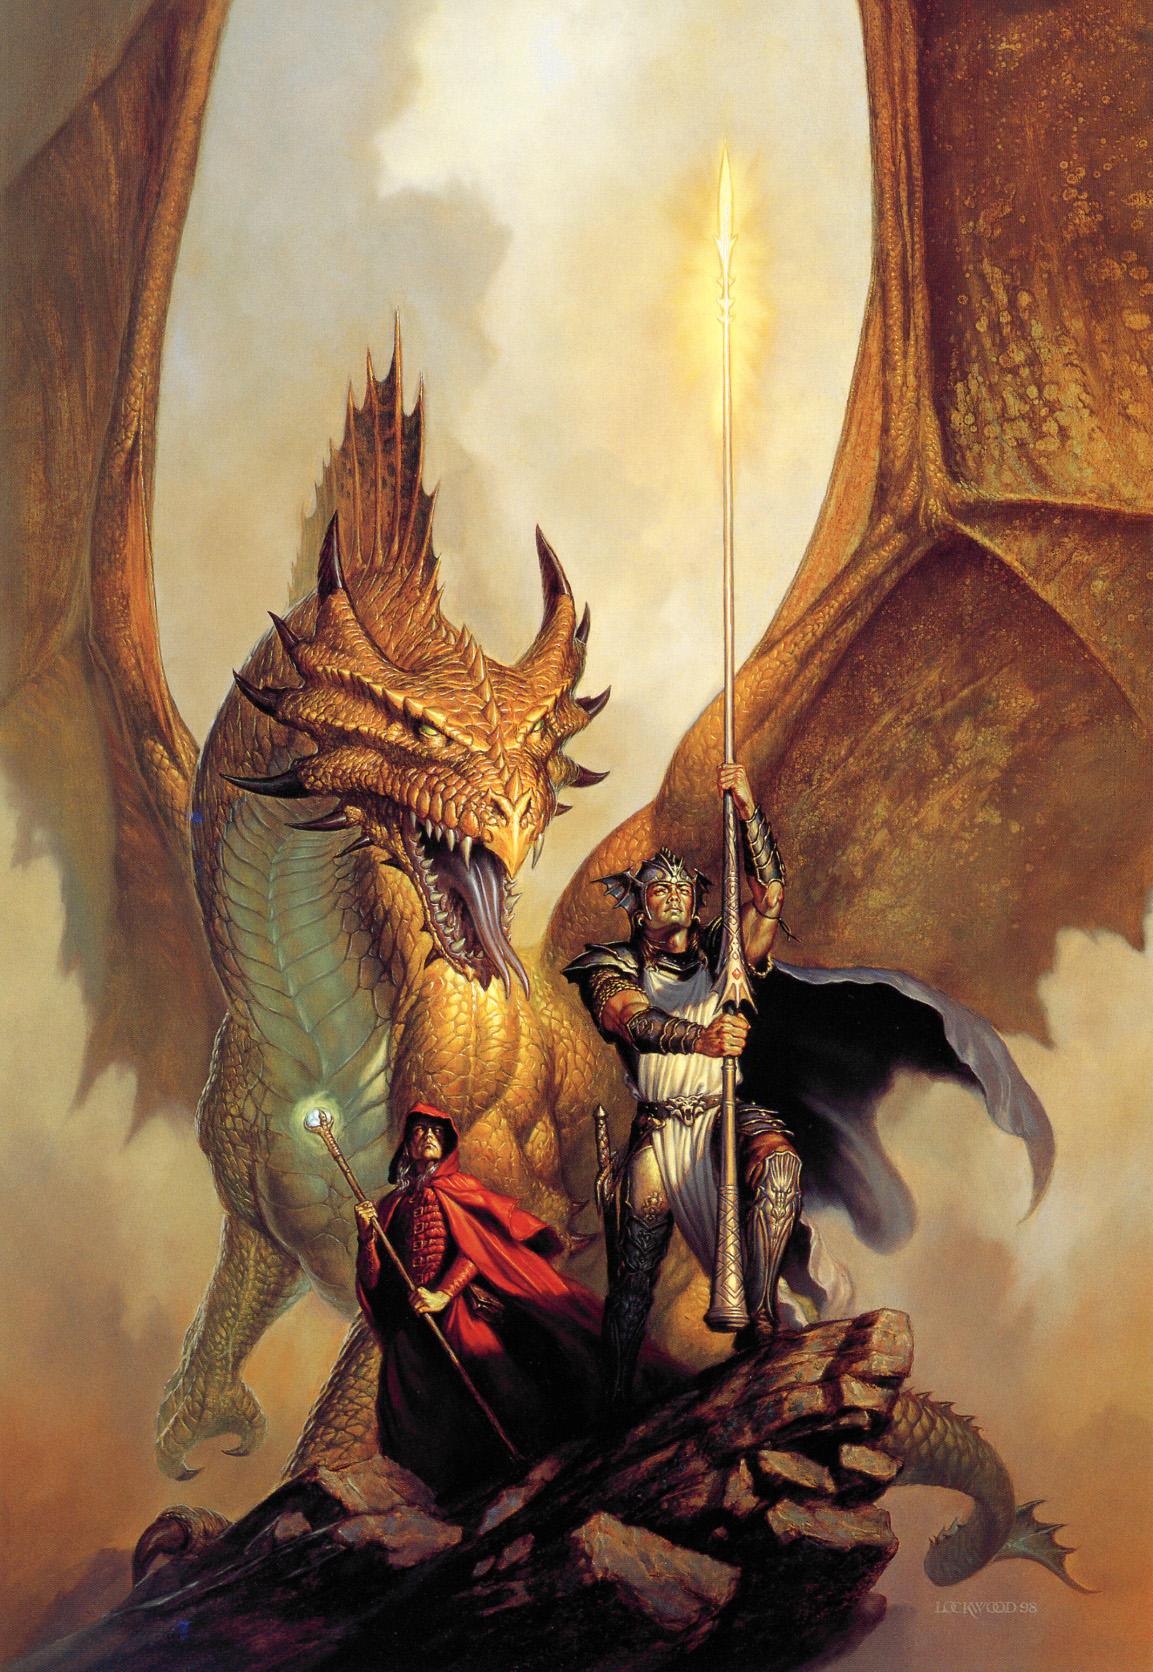 Dragonlance Wallpaper Album hq wallpapers 1153x1672